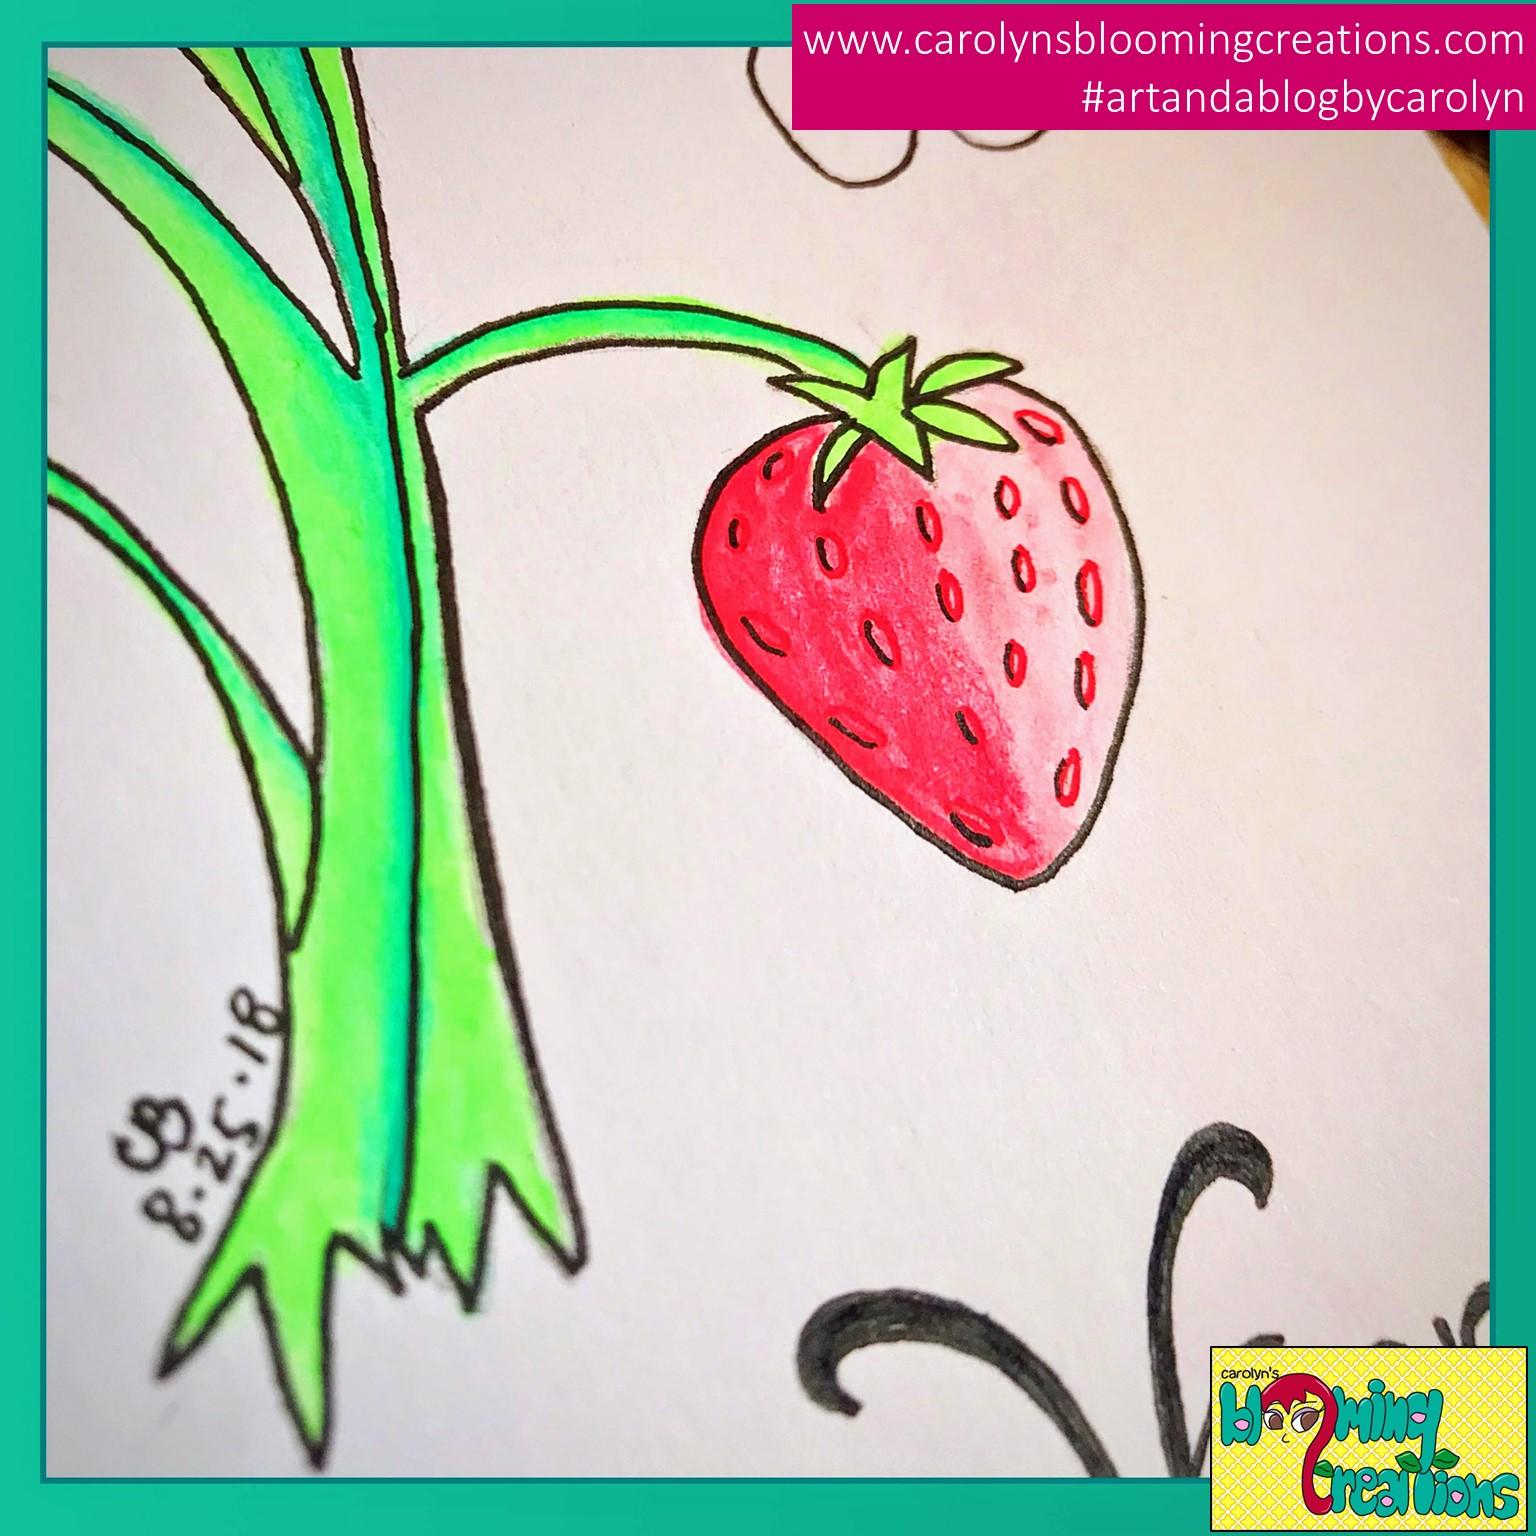 Pin Me! www.carolynsbloomingcreations.com  Art detail by Carolyn J. Braden, Media: Gelly Roll pens and BIC pencil.